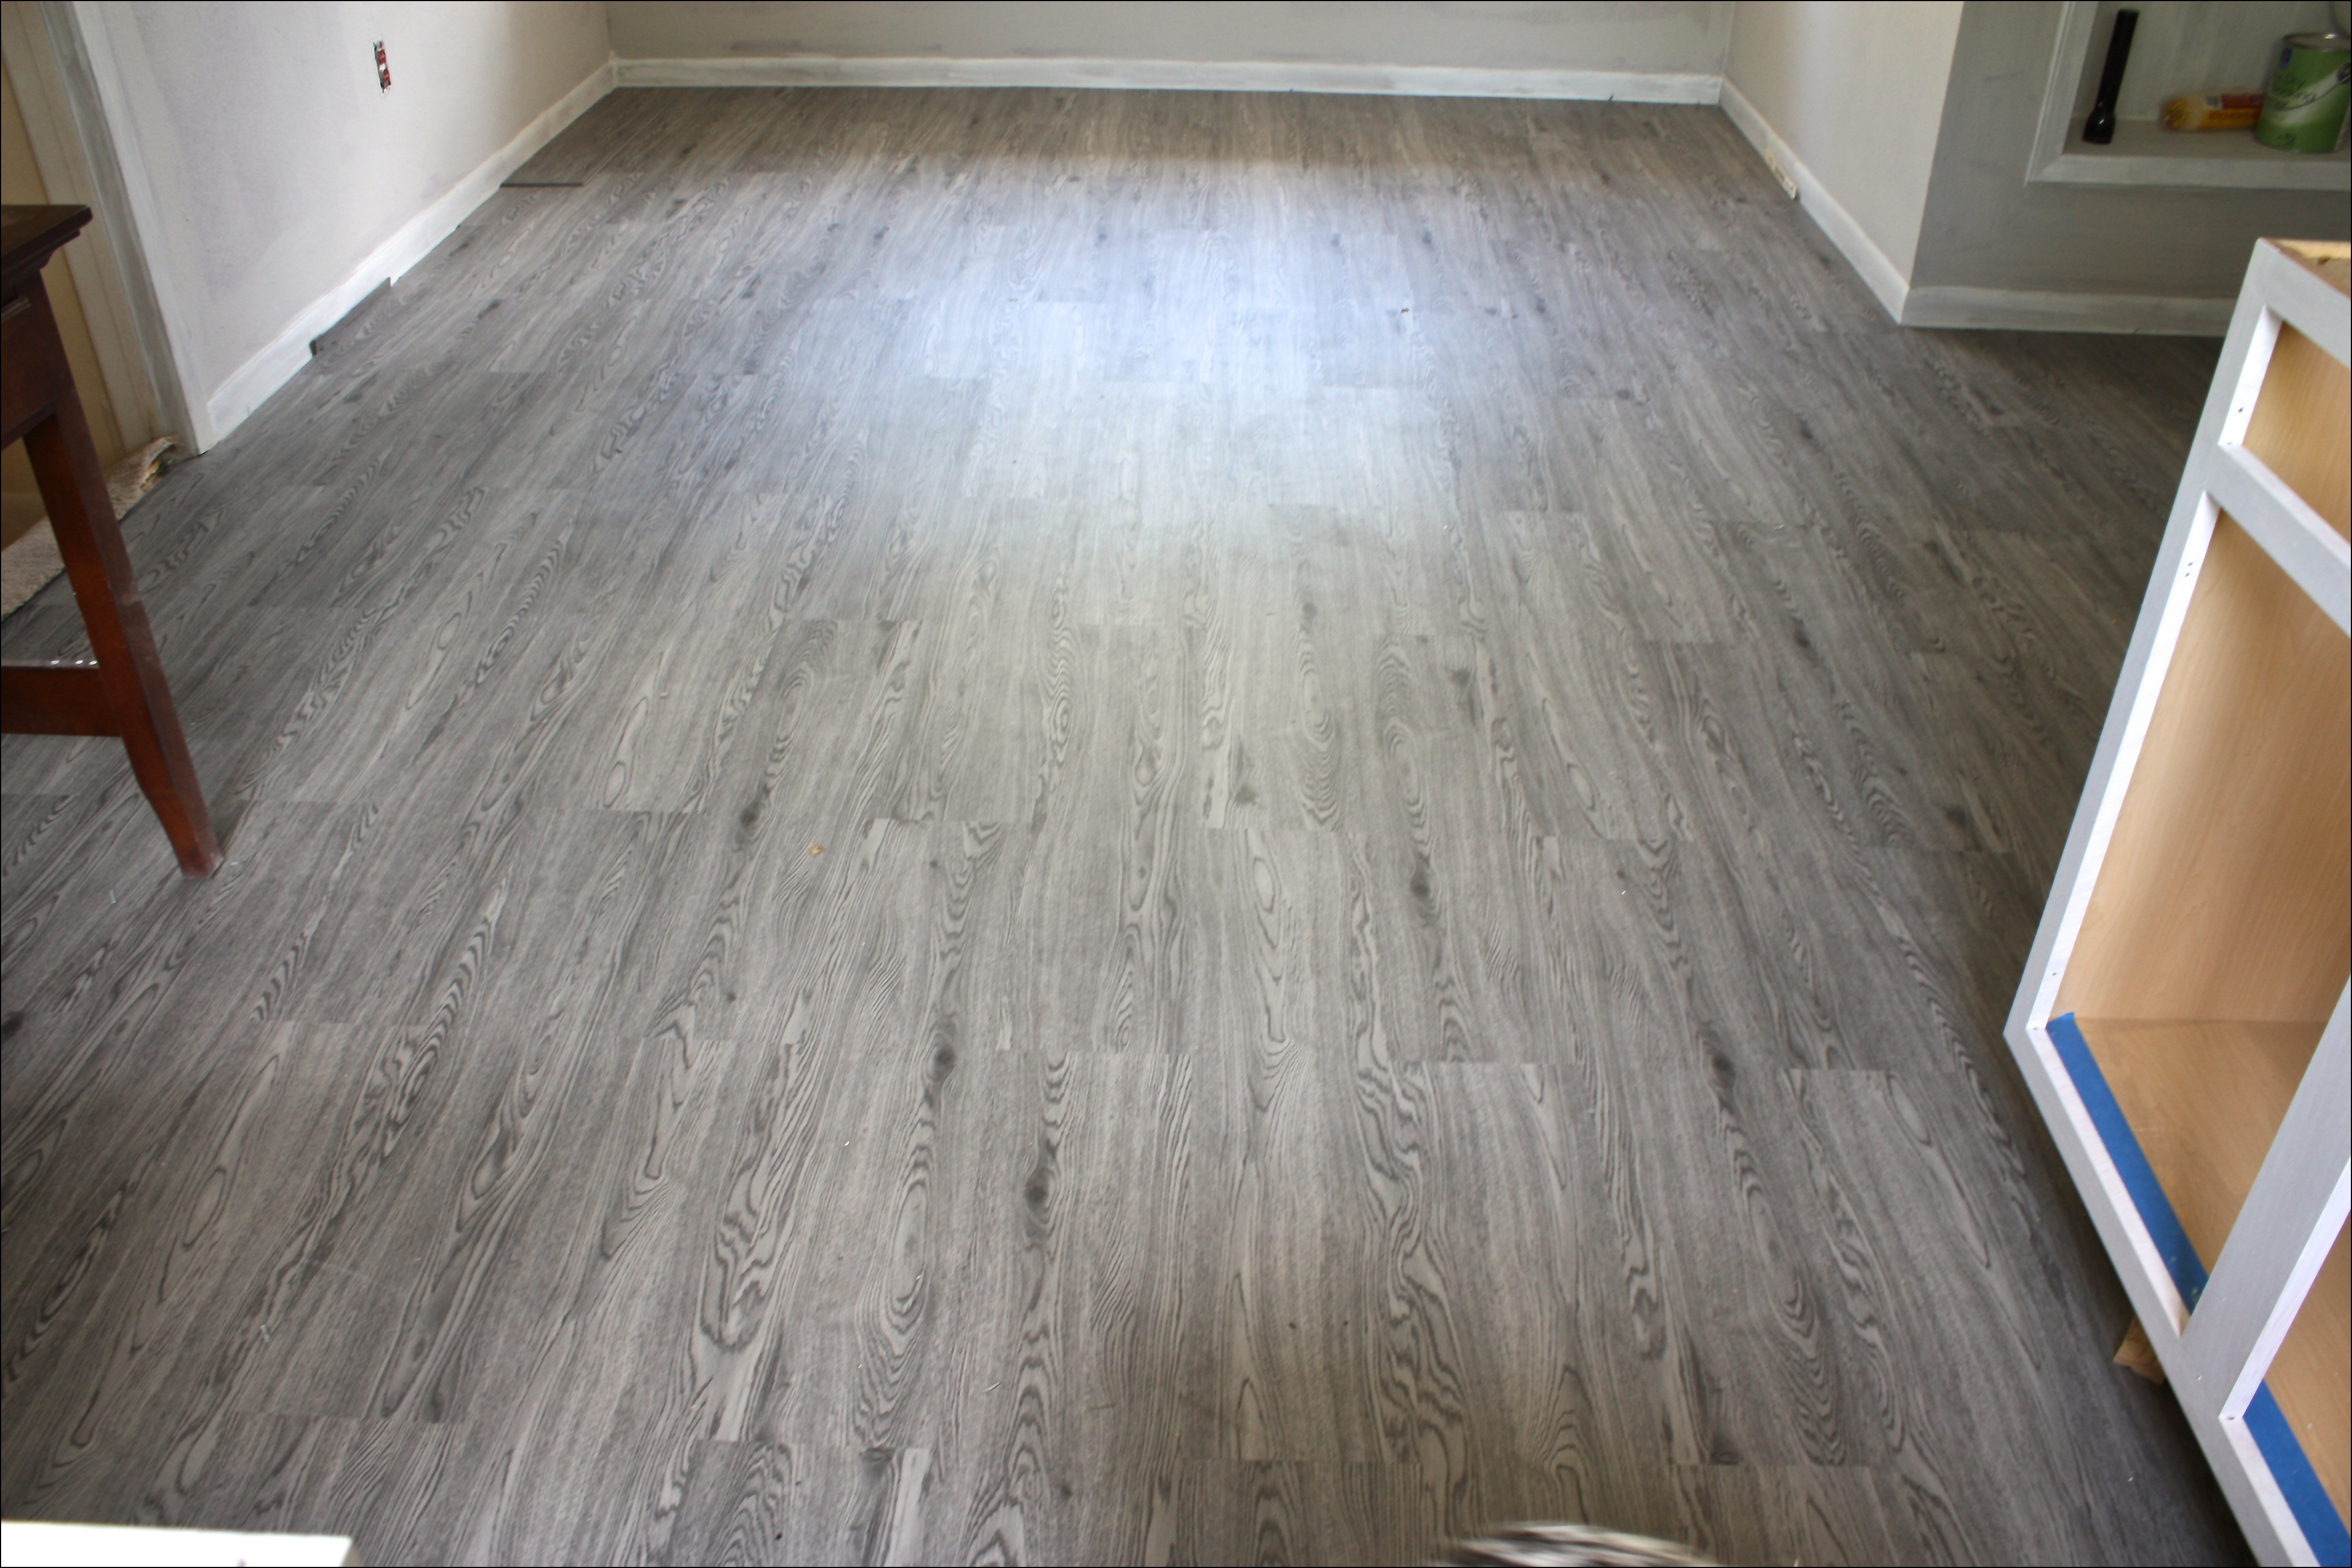 wide plank hardwood flooring unfinished of wide plank flooring ideas regarding wide plank wood flooring lowes photographies kitchen shop vinylank at lowes flooring vs laminate wood of